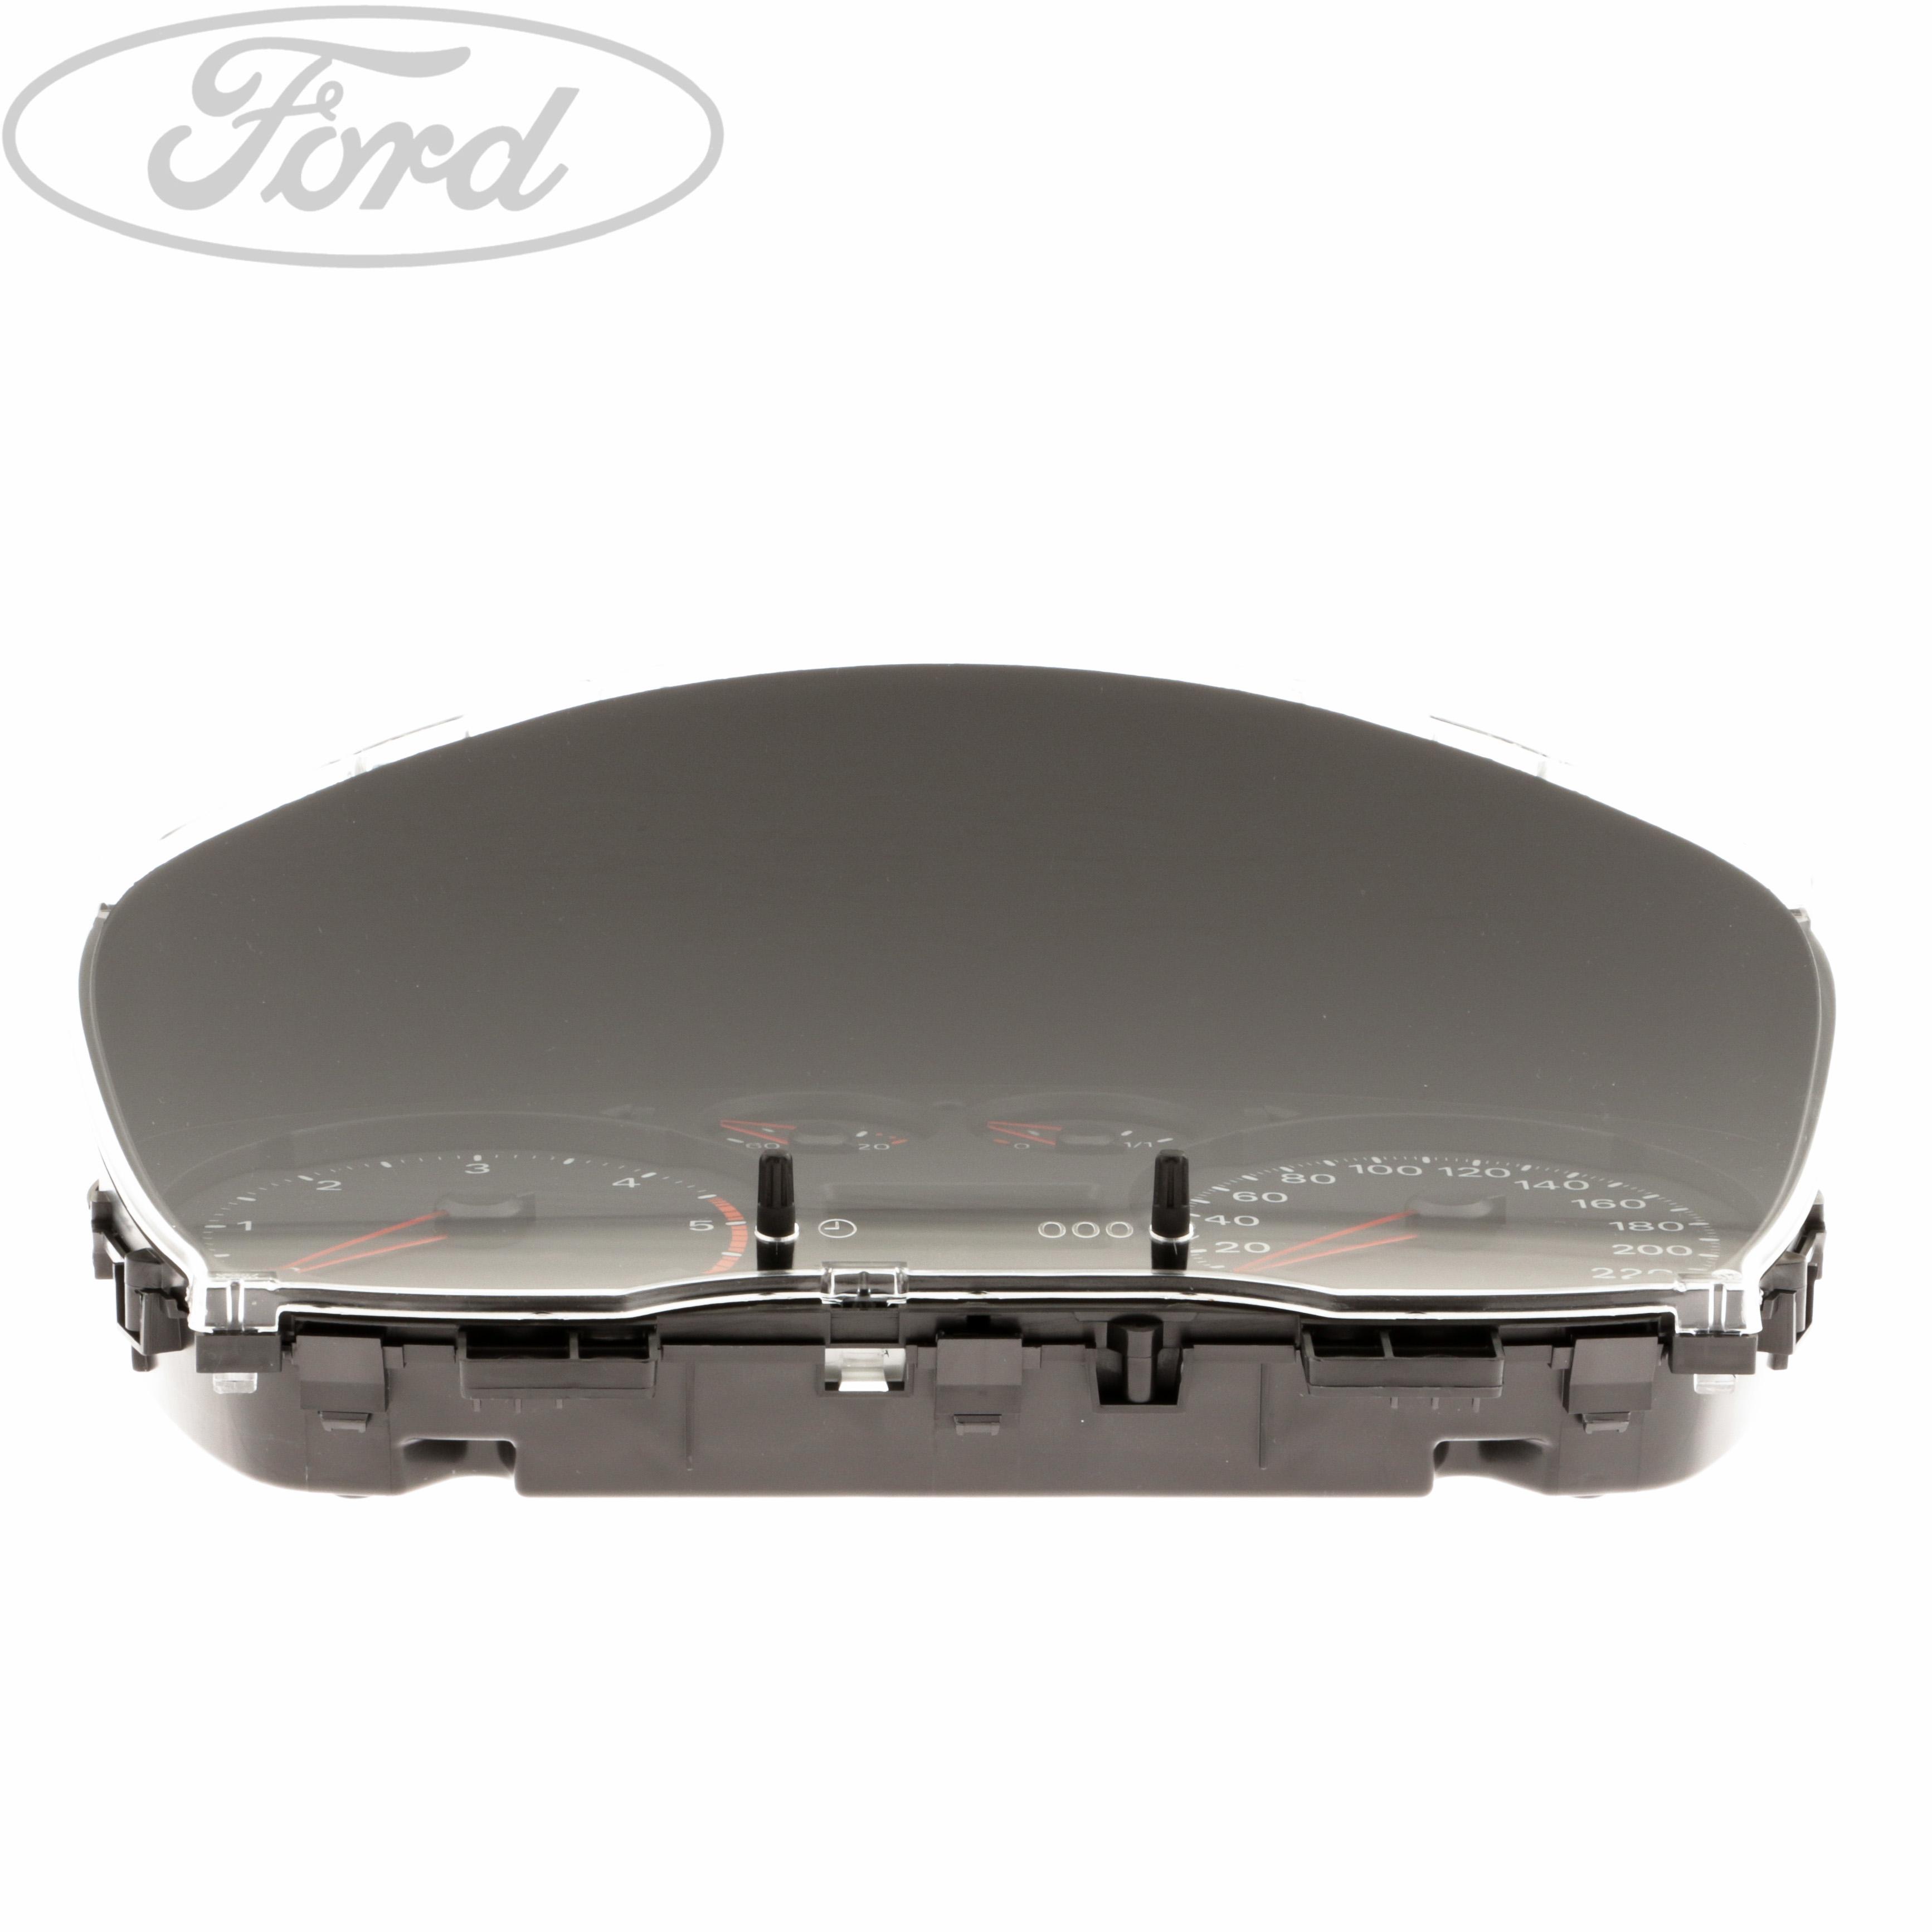 Genuine Ford Speedo Instrument Cluster Dial Gauge Clock